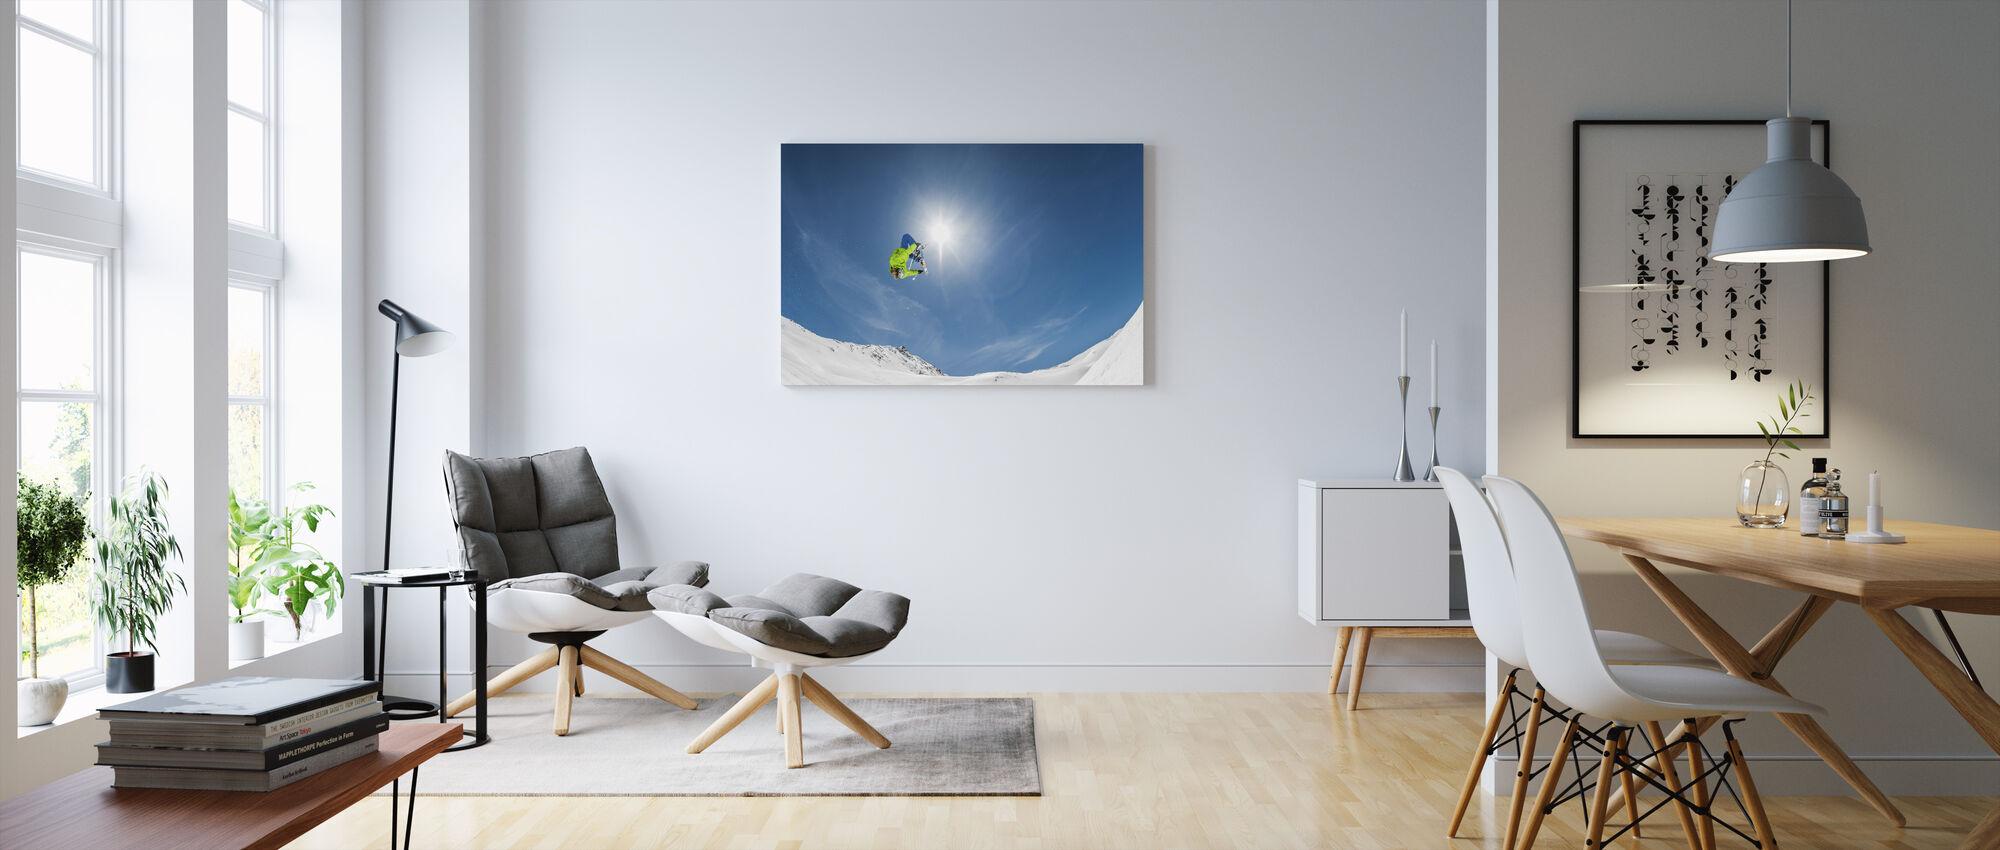 Backflip Crossed Skis - Canvas print - Living Room